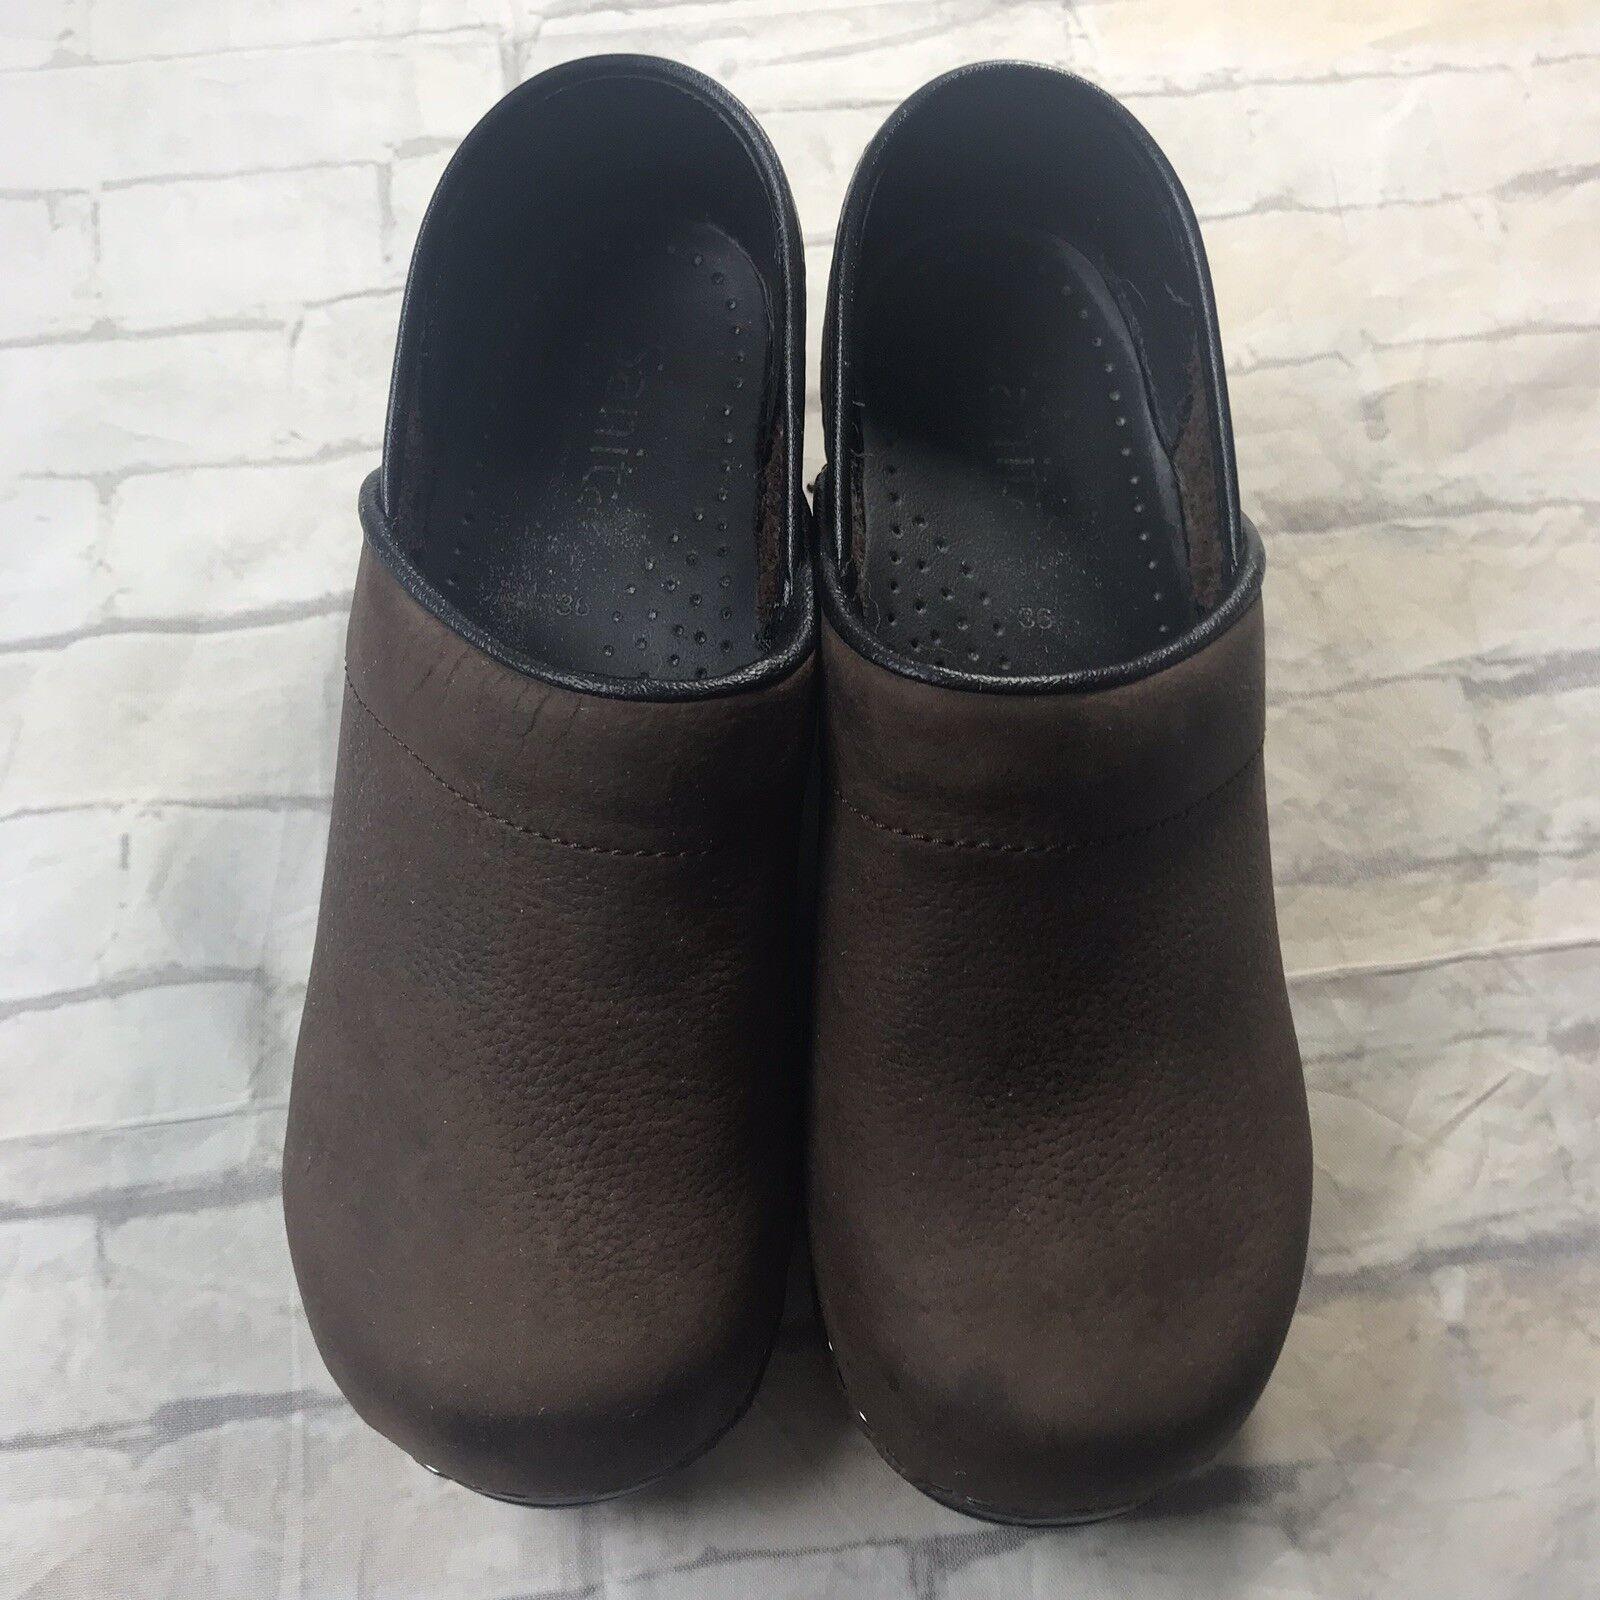 Sanita Koi Professional Nursing Clogs Size 6 36 Women Brown Brown Brown Leather Slip On shoes 202e73